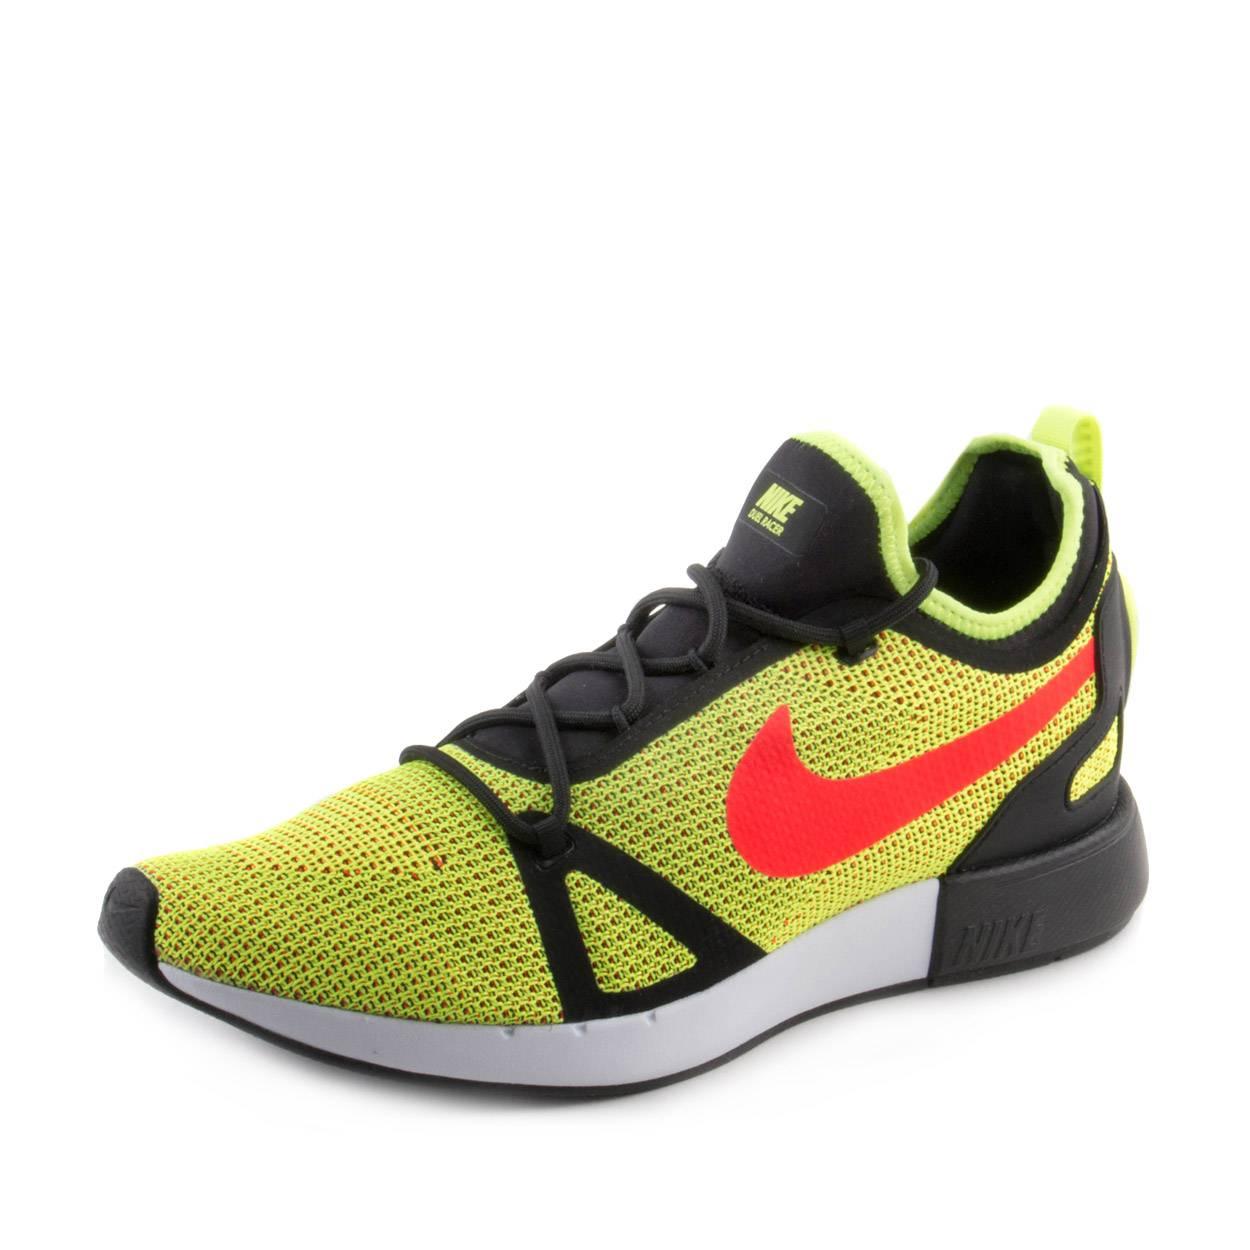 395918b1ea07 Nike Mens Nike Duel Racer 918228-700 - Sole-Unlimited